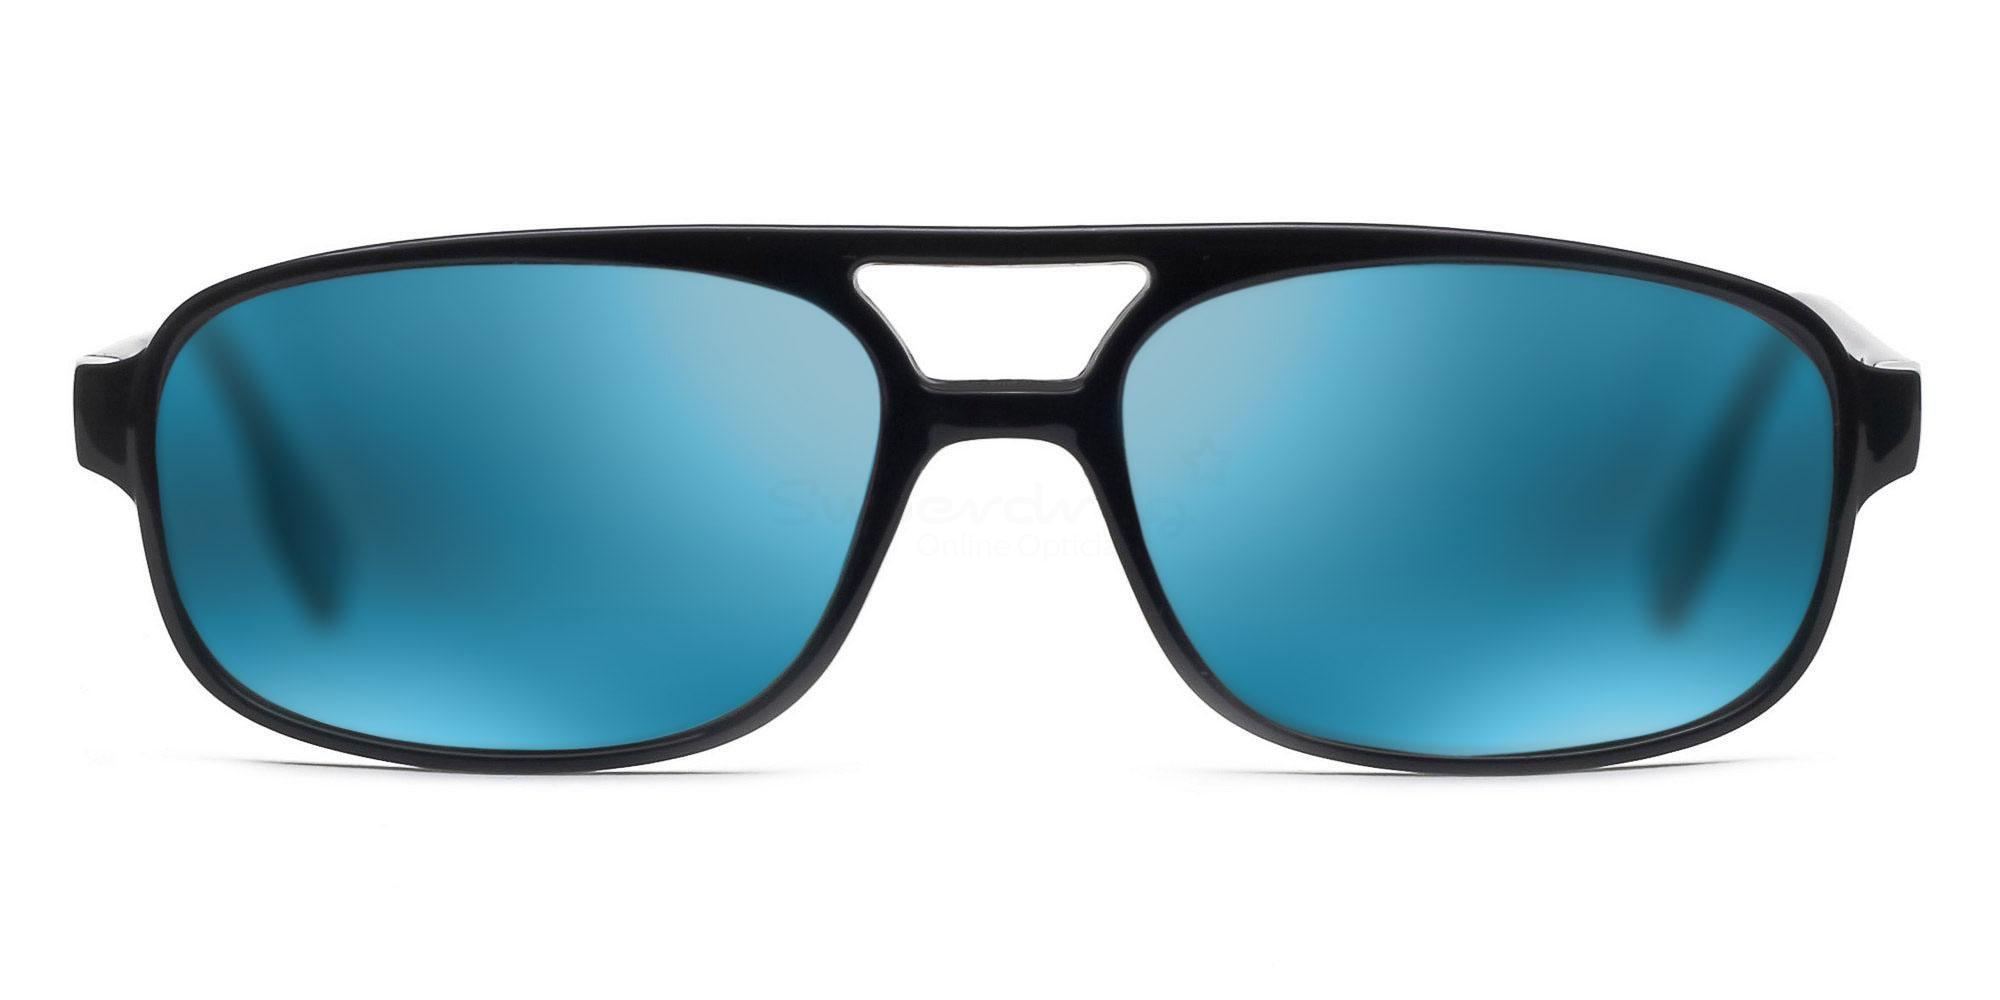 C01 Polarized Grey with Green Mirror P2395 - Black (Mirrored Polarized) Sunglasses, Neon